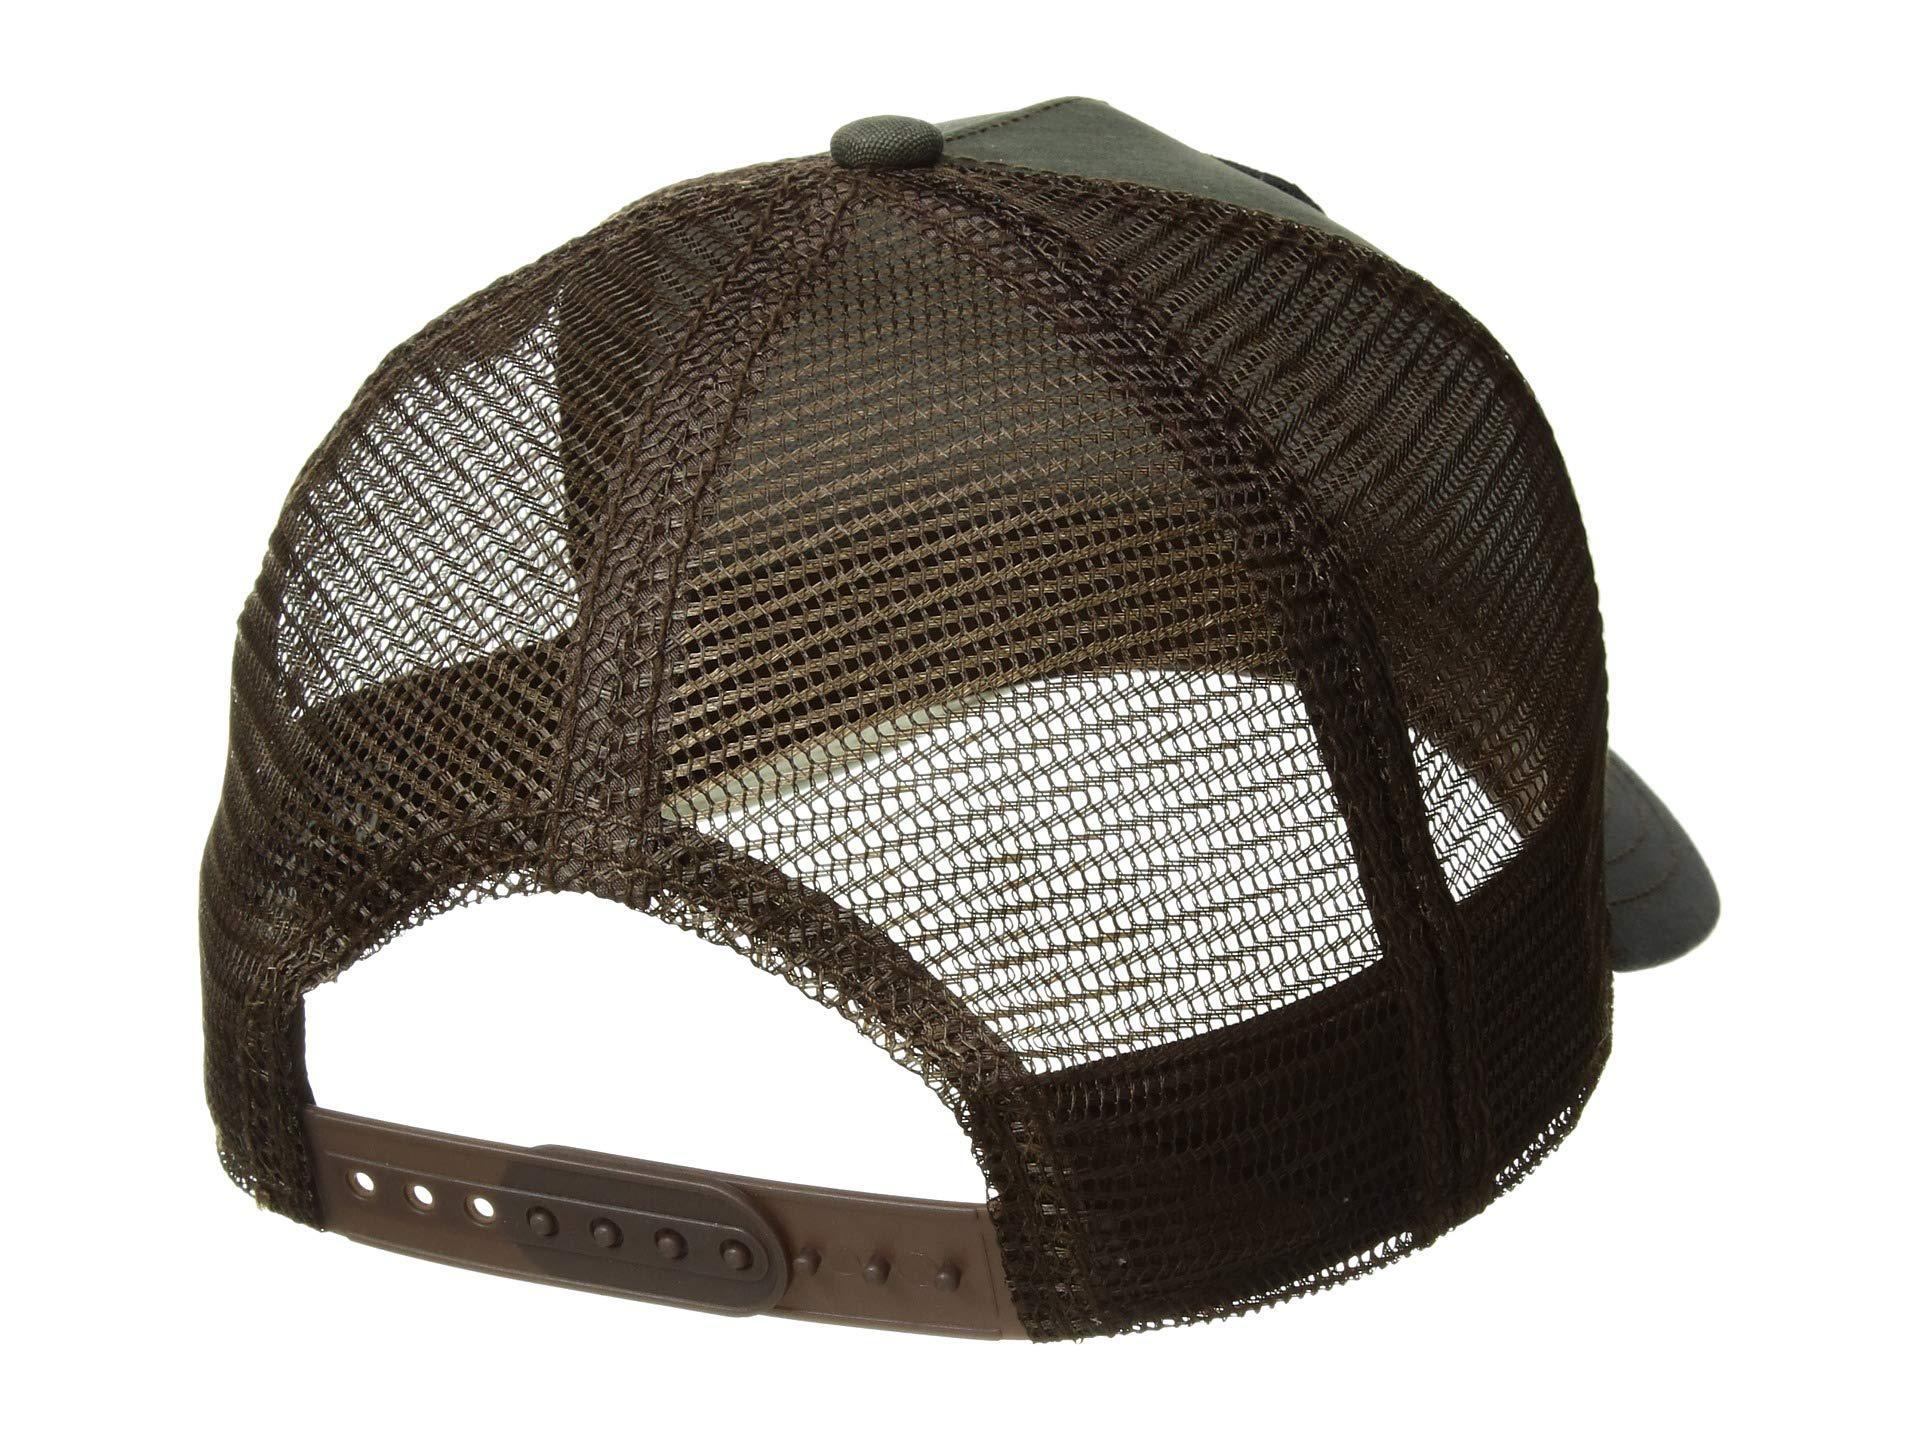 Goorin Bros - Green Animal Farm Snap Back Trucker Hat (olive Donkey) Caps  for. View fullscreen 6639591f99f5